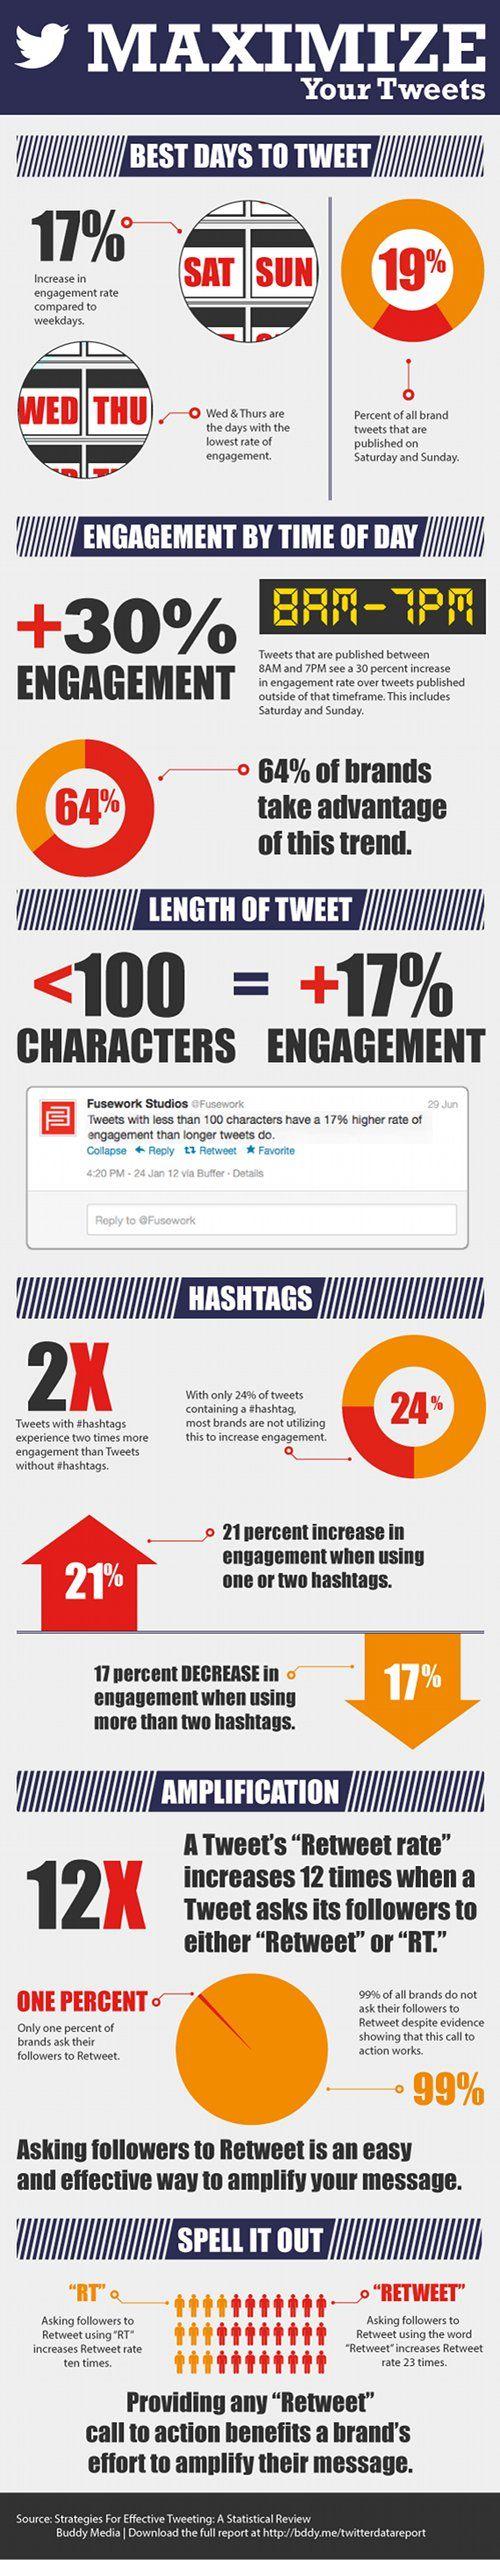 Maximizing your tweets